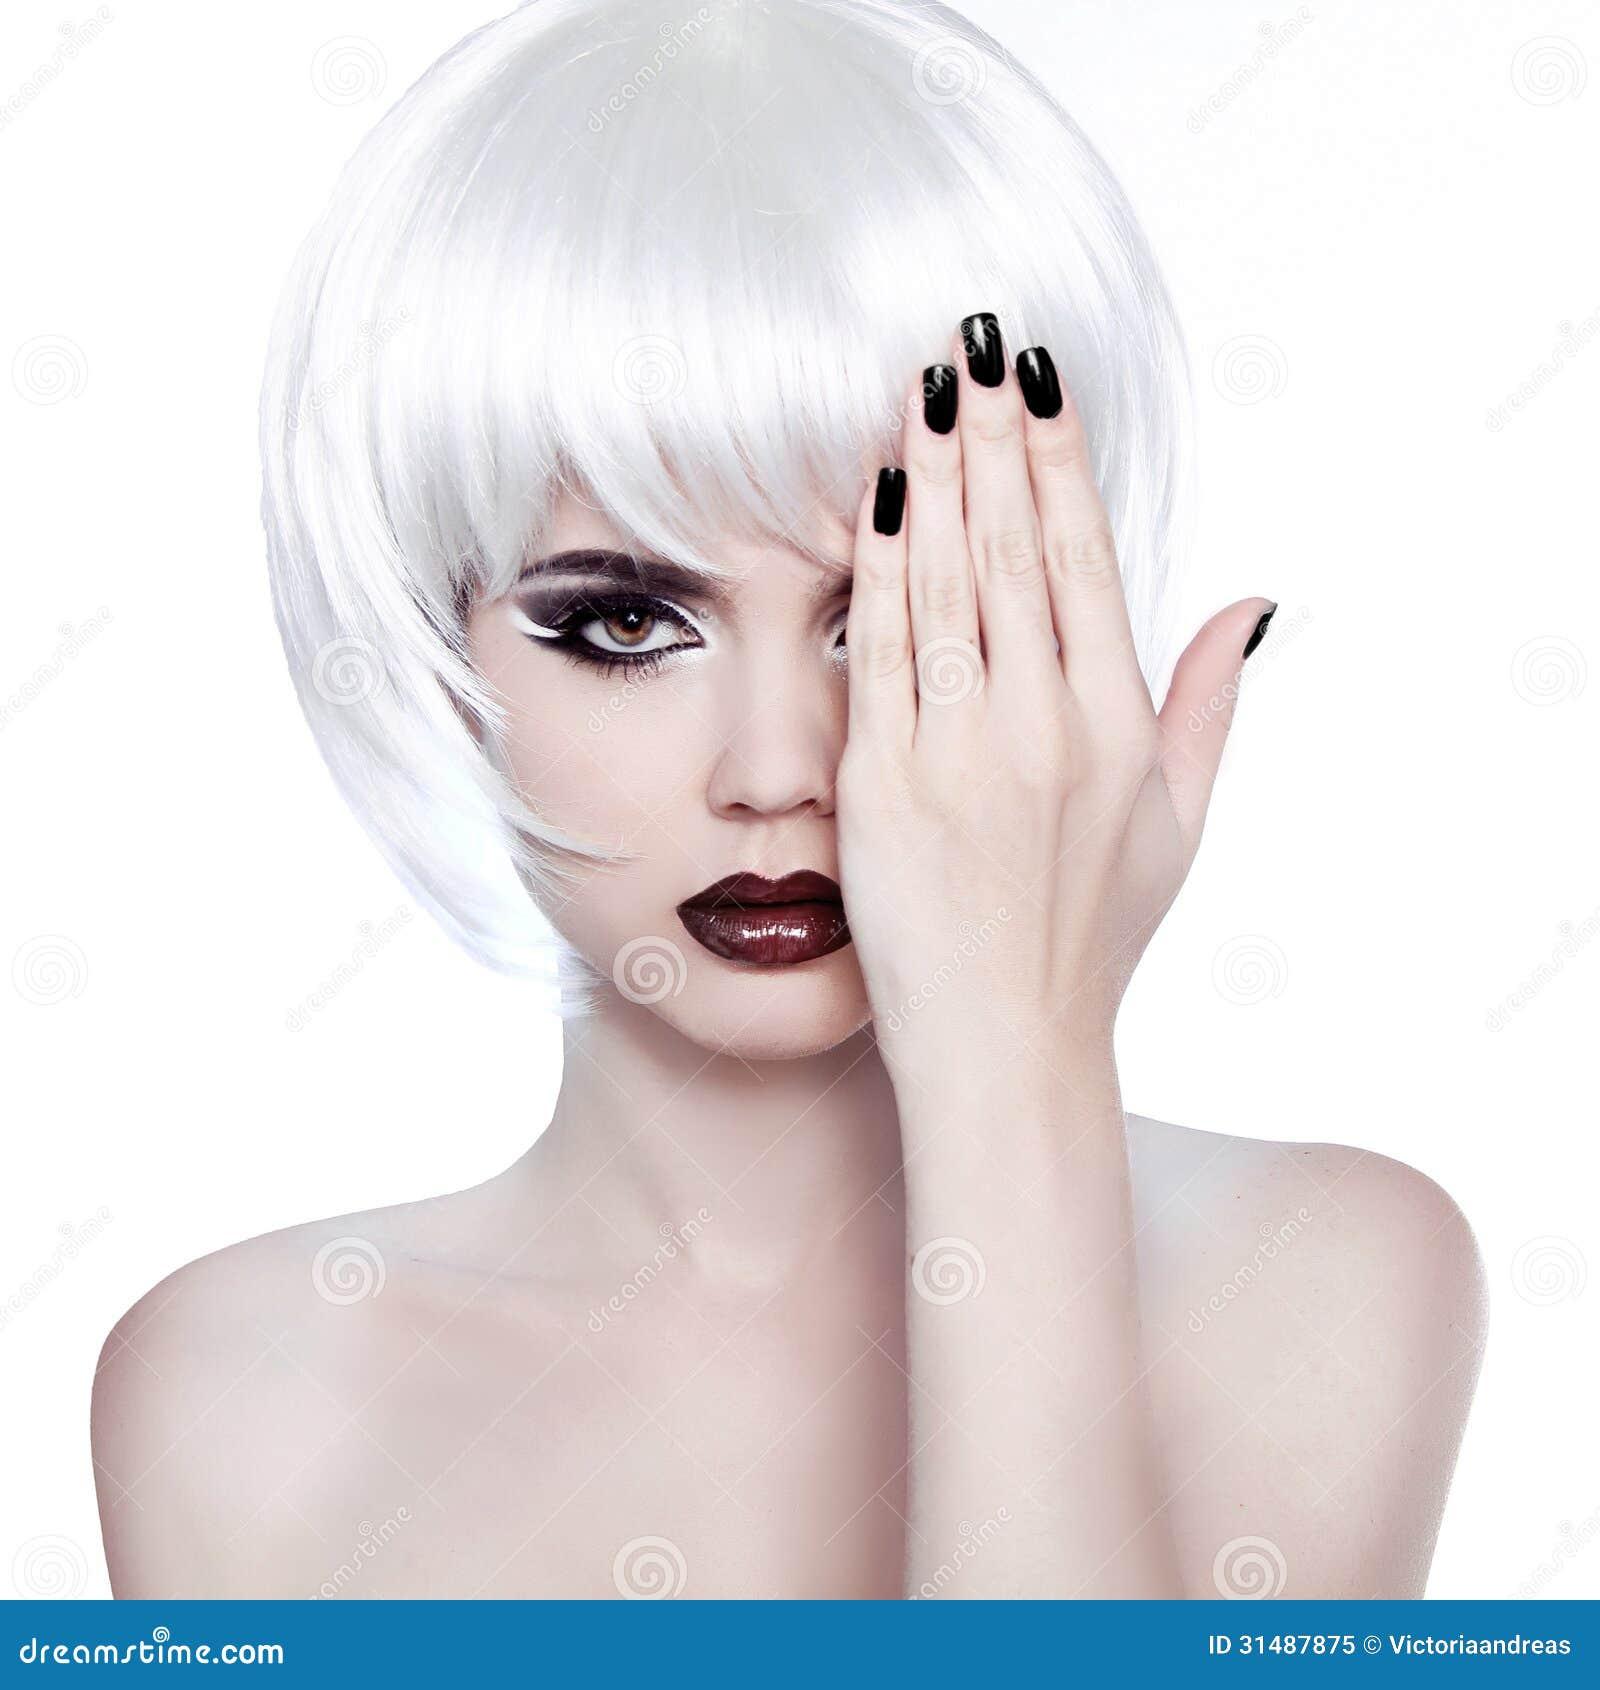 Vogue Style Woman. Fashion Beauty Woman Portrait With